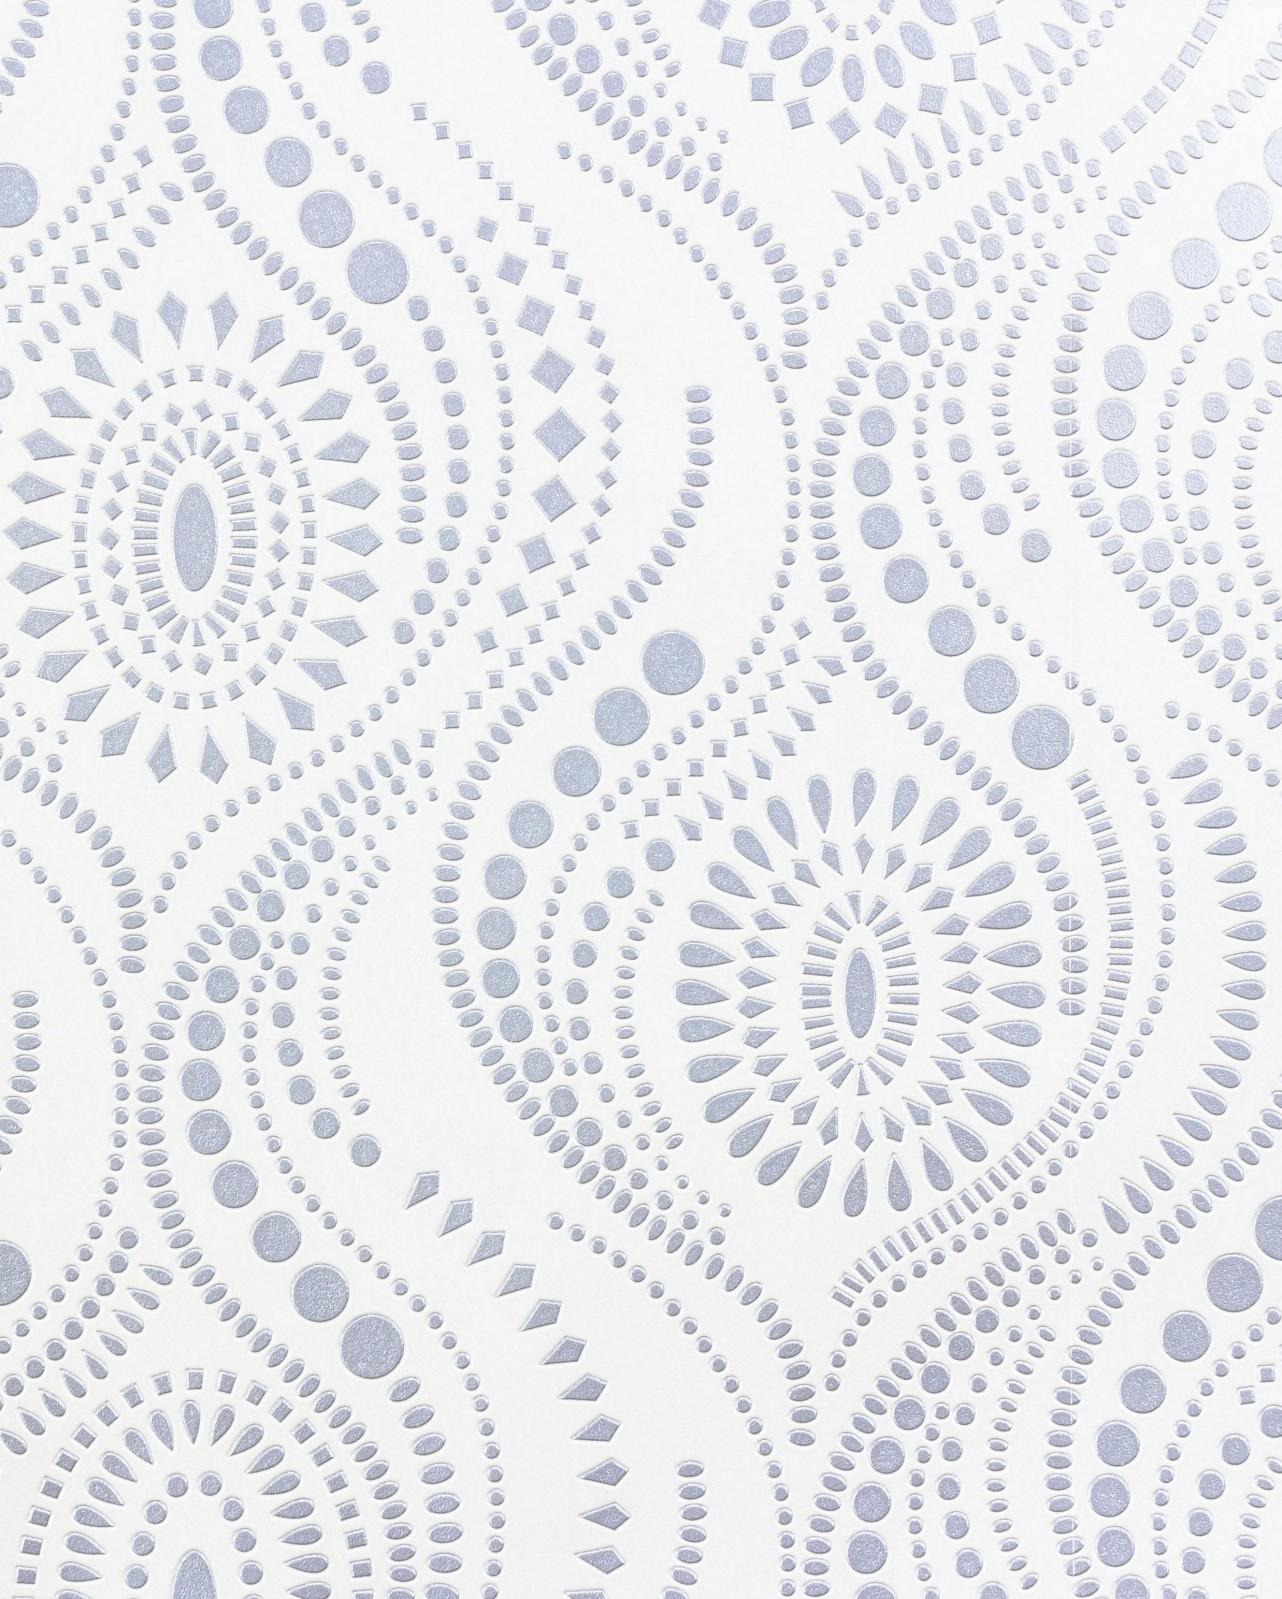 Wallpaper rasch vinyl wallpaper aqua relief pattern white for Tapeten rasch